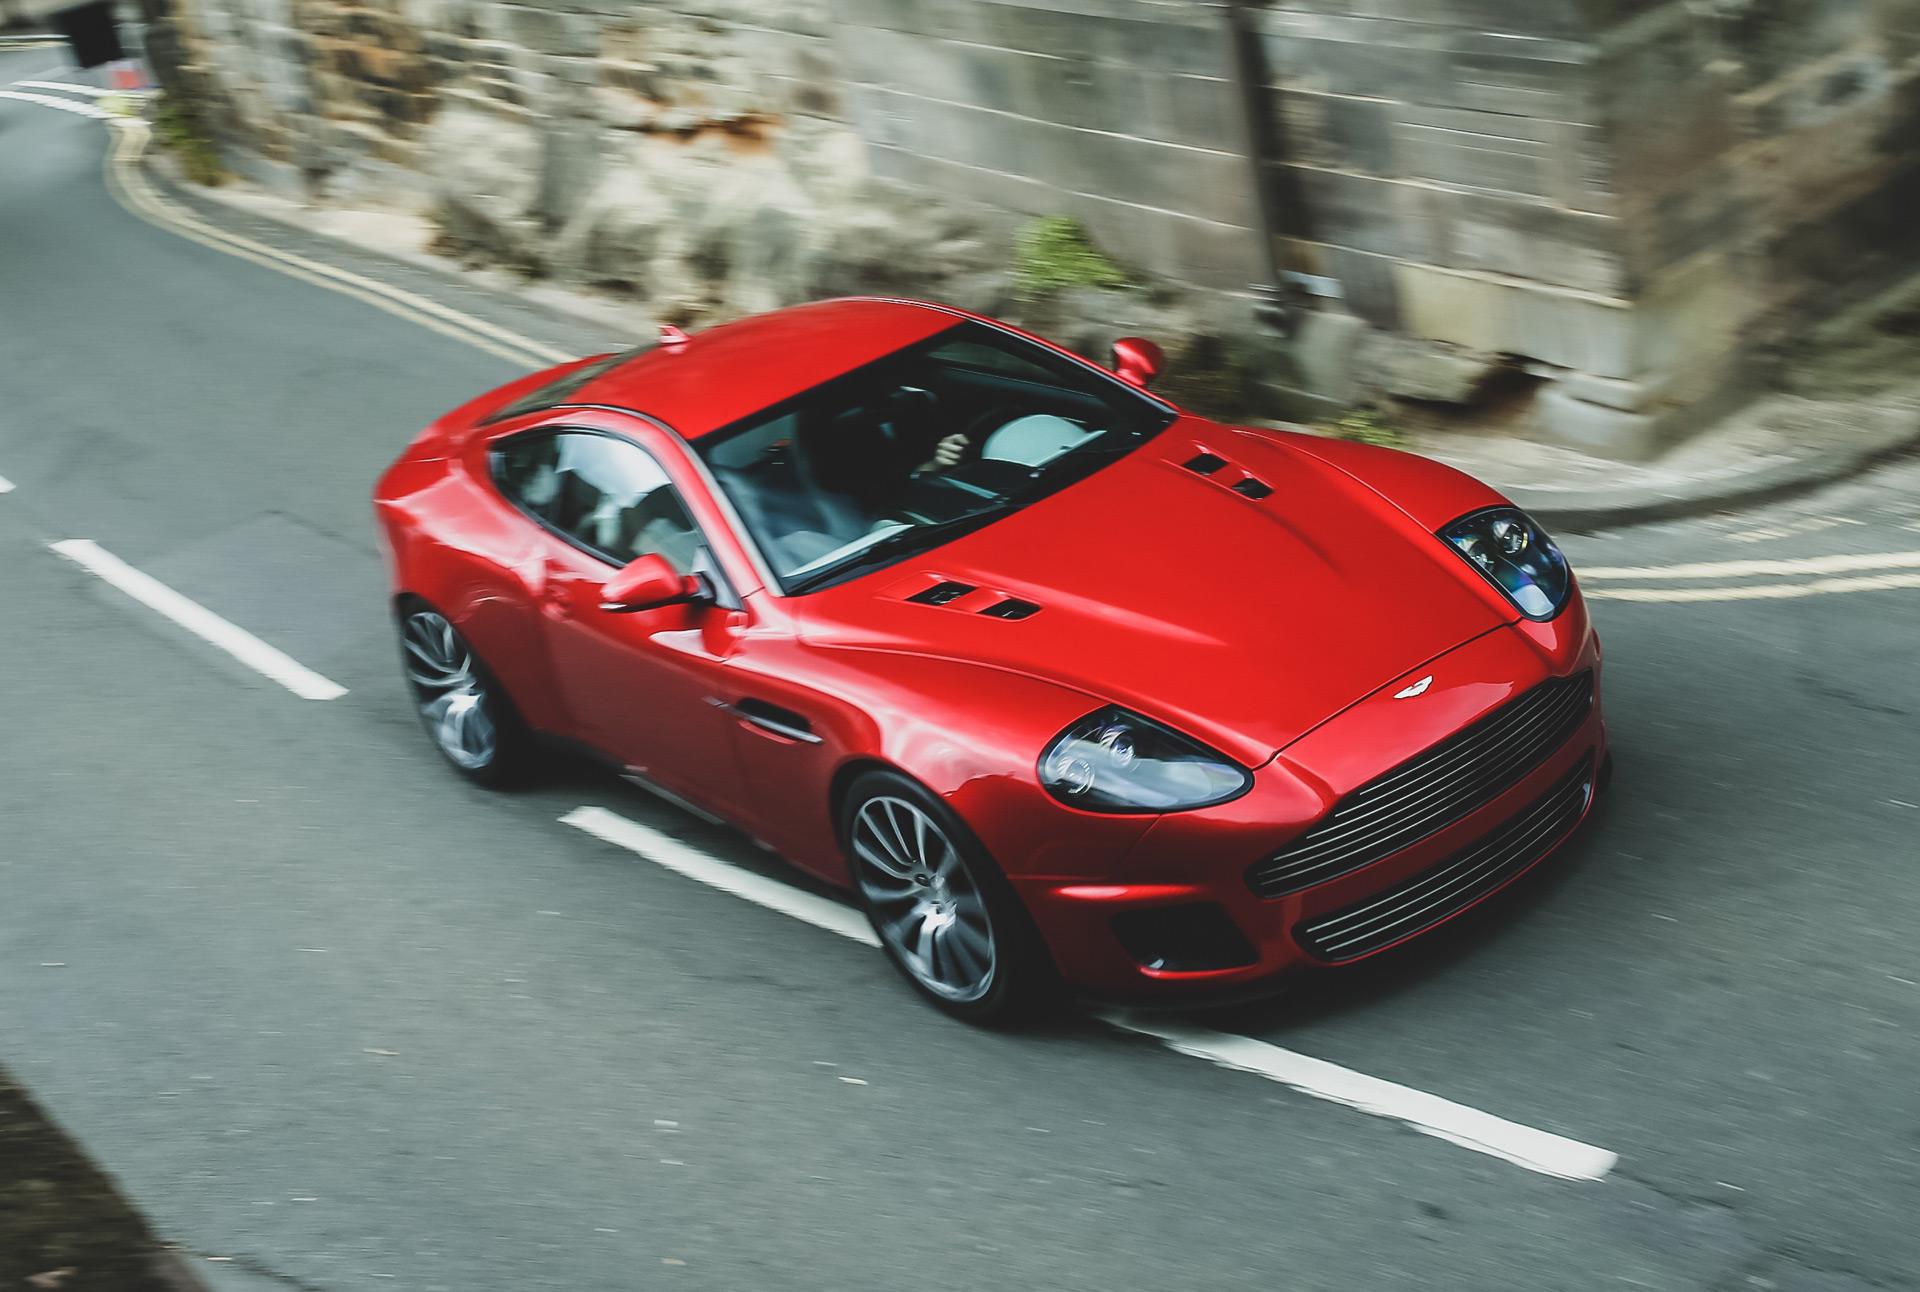 Original Aston Martin Vanquish Reimagined By Ian Callum Ready For Production